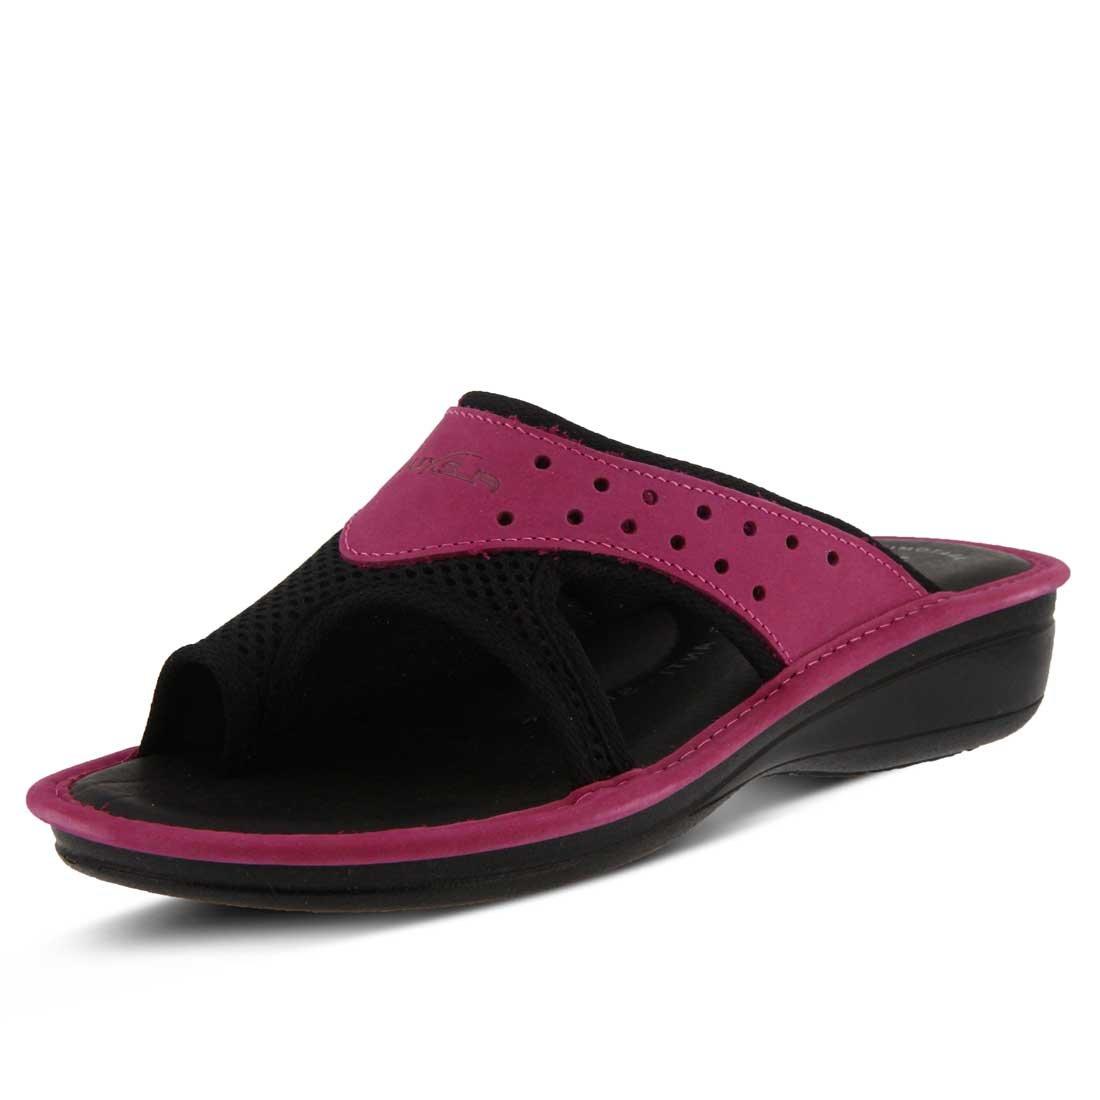 Pascalle Slide Sandal B01N0FRPOR 42 M EU|Fuchsia Nubuck/Black Mesh